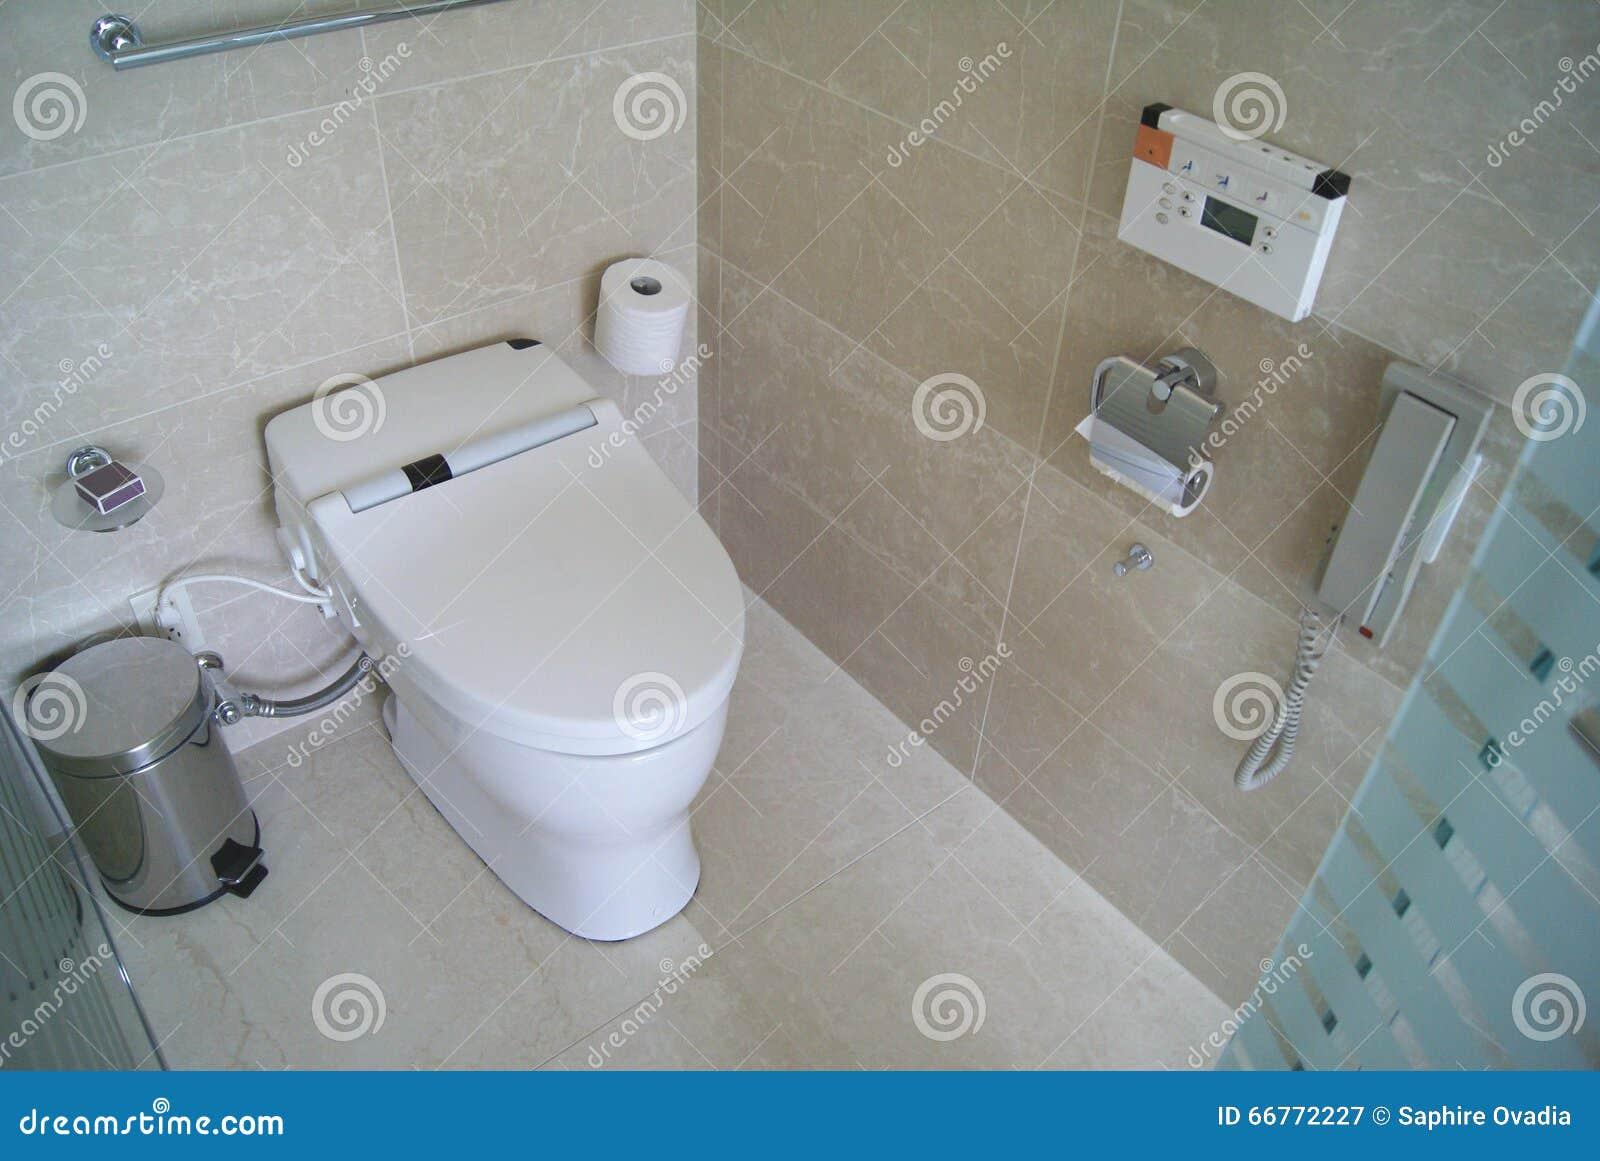 Electronic Toilet Seat. Bidet. Electronic Bidet. Stock Illustration ...